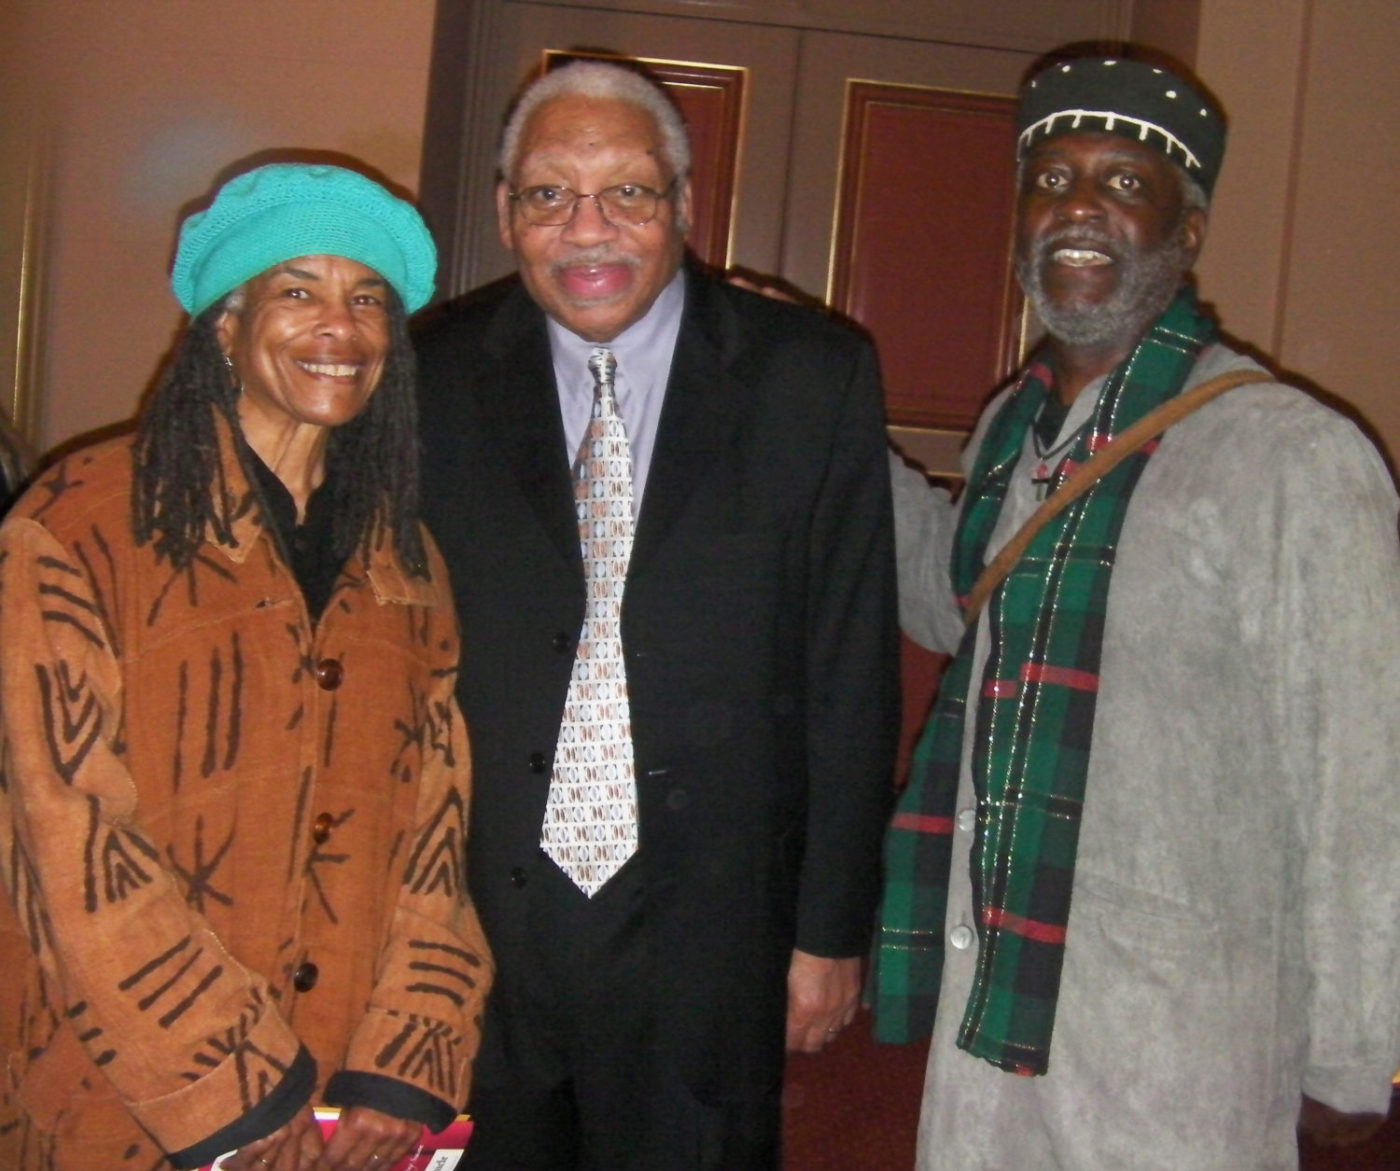 Queen-Mama-Tureeda-Mikell-Ellis-Louis-Marsalis-Jr.-Baba-Jahahara-at-SF-Jazz-by-Baba-Jahahara-1400x1171, WE are the 'eight ball'!, Culture Currents